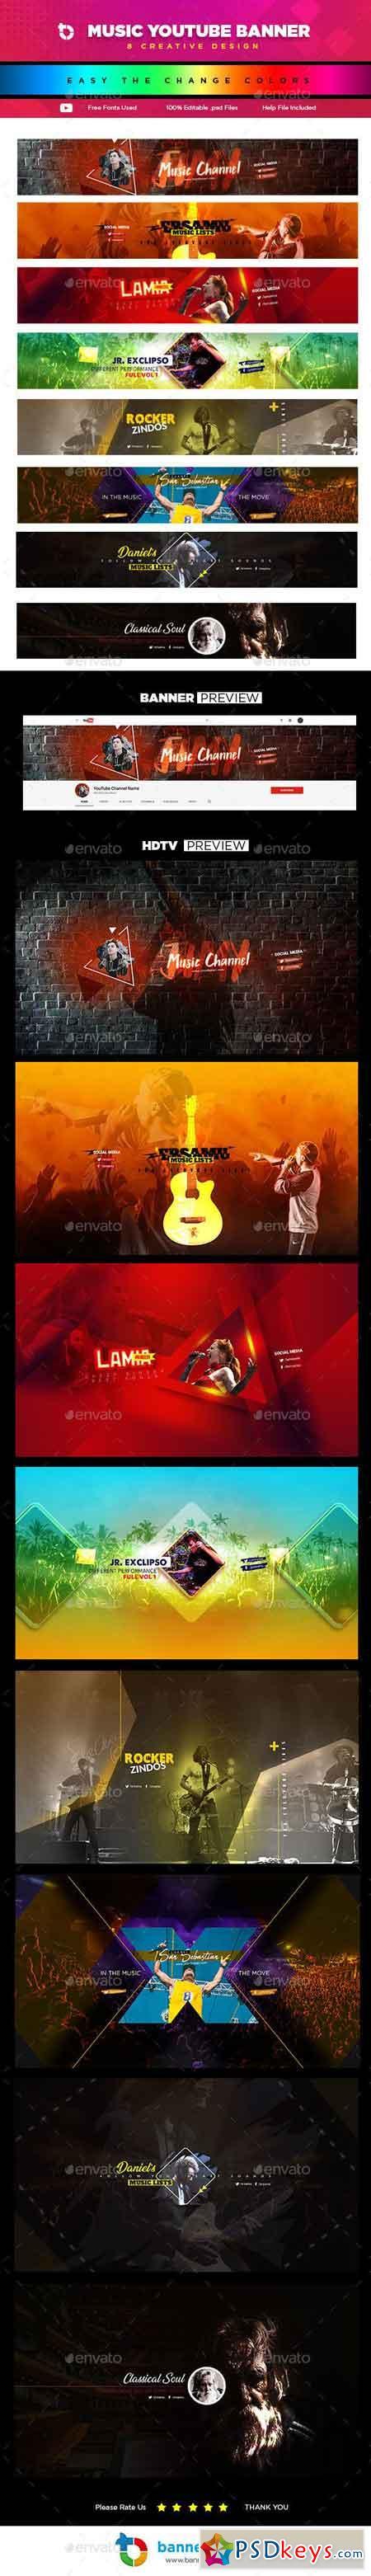 8 Creative Music YouTube Banners 23143457